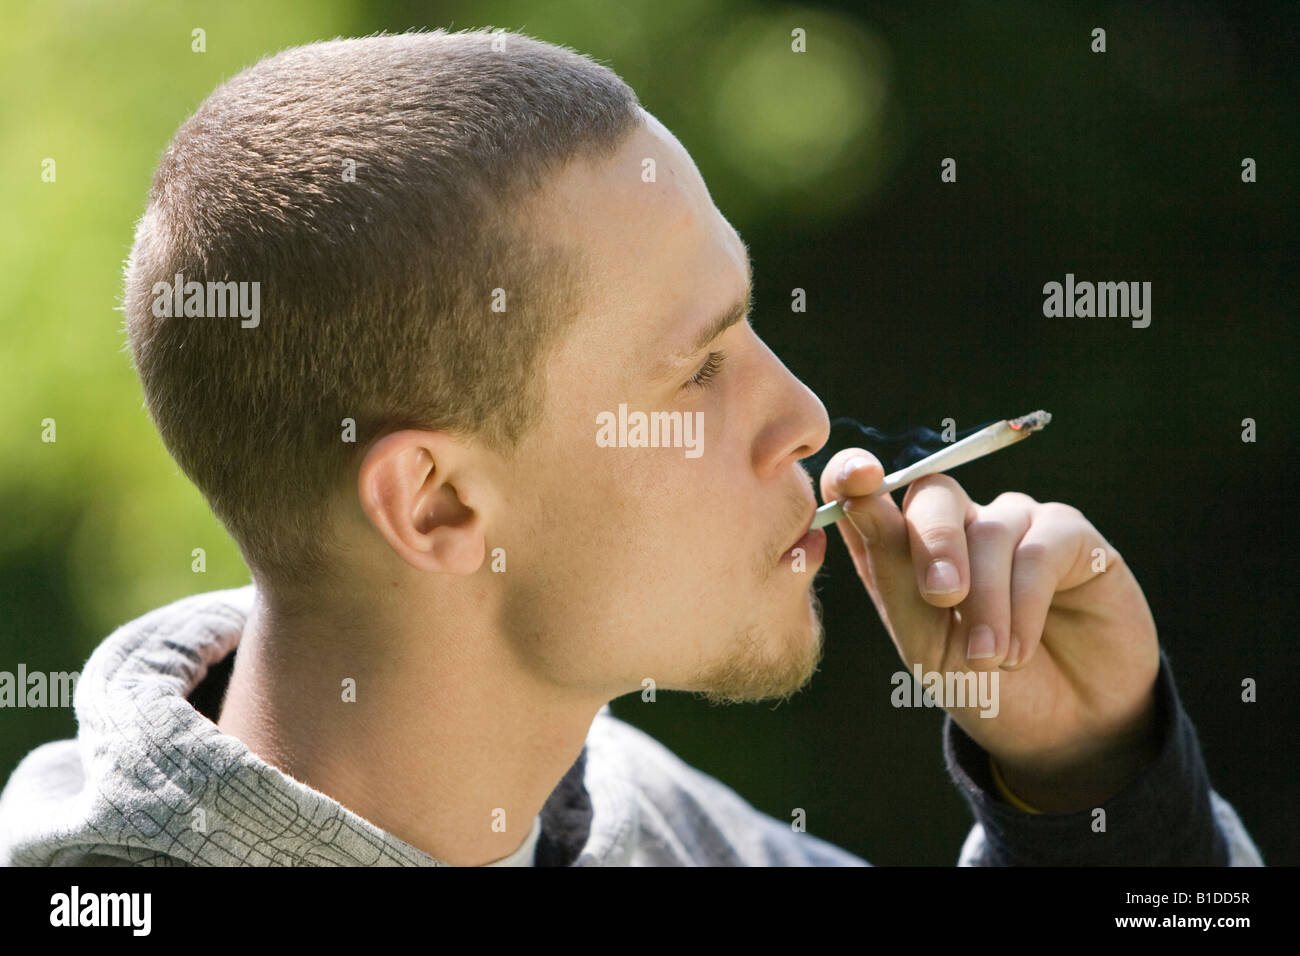 Joven fumar cigarrillo afuera Imagen De Stock